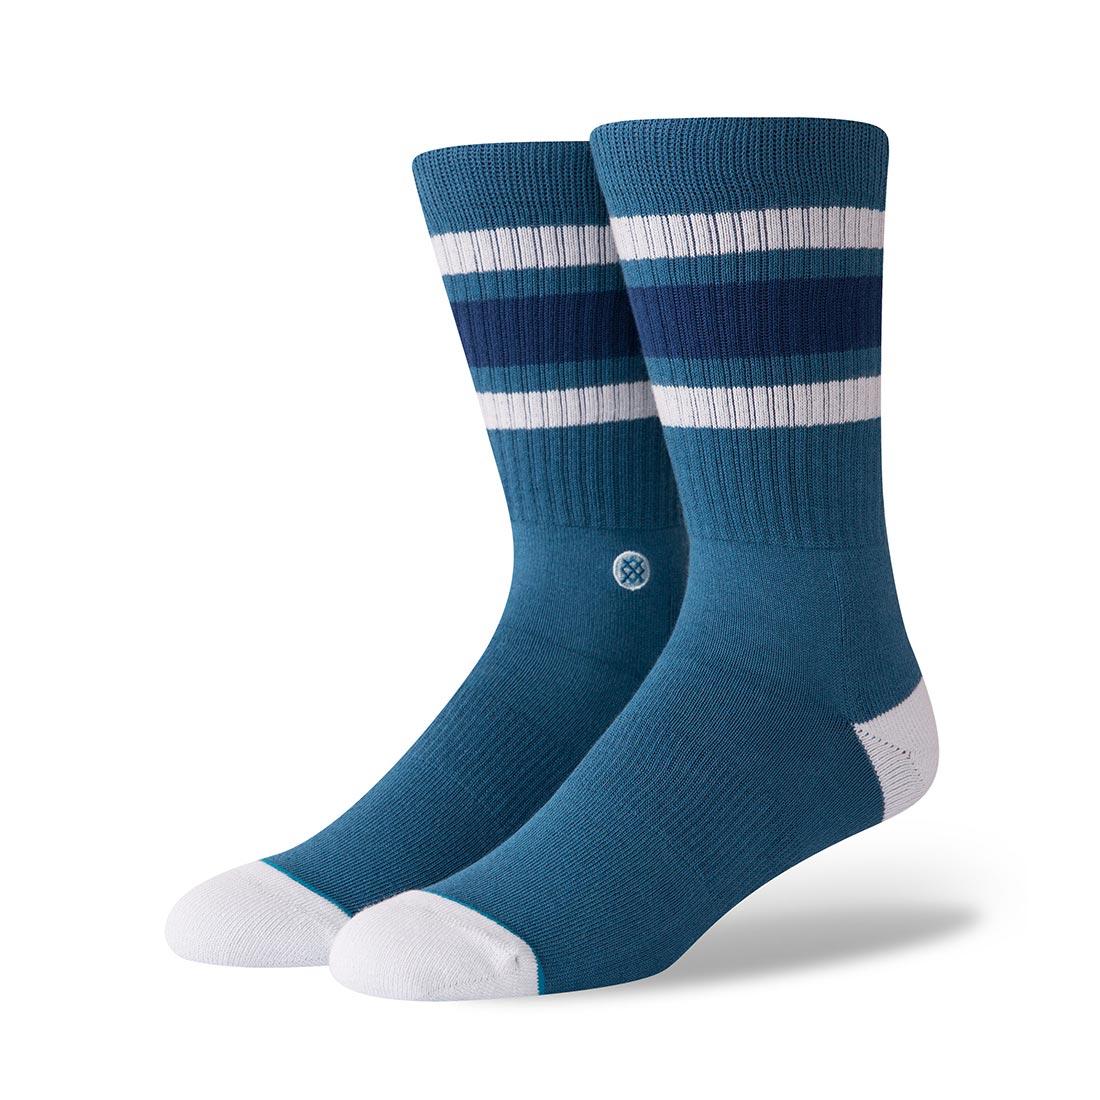 Stance Boyd 4 Socks - Indigo